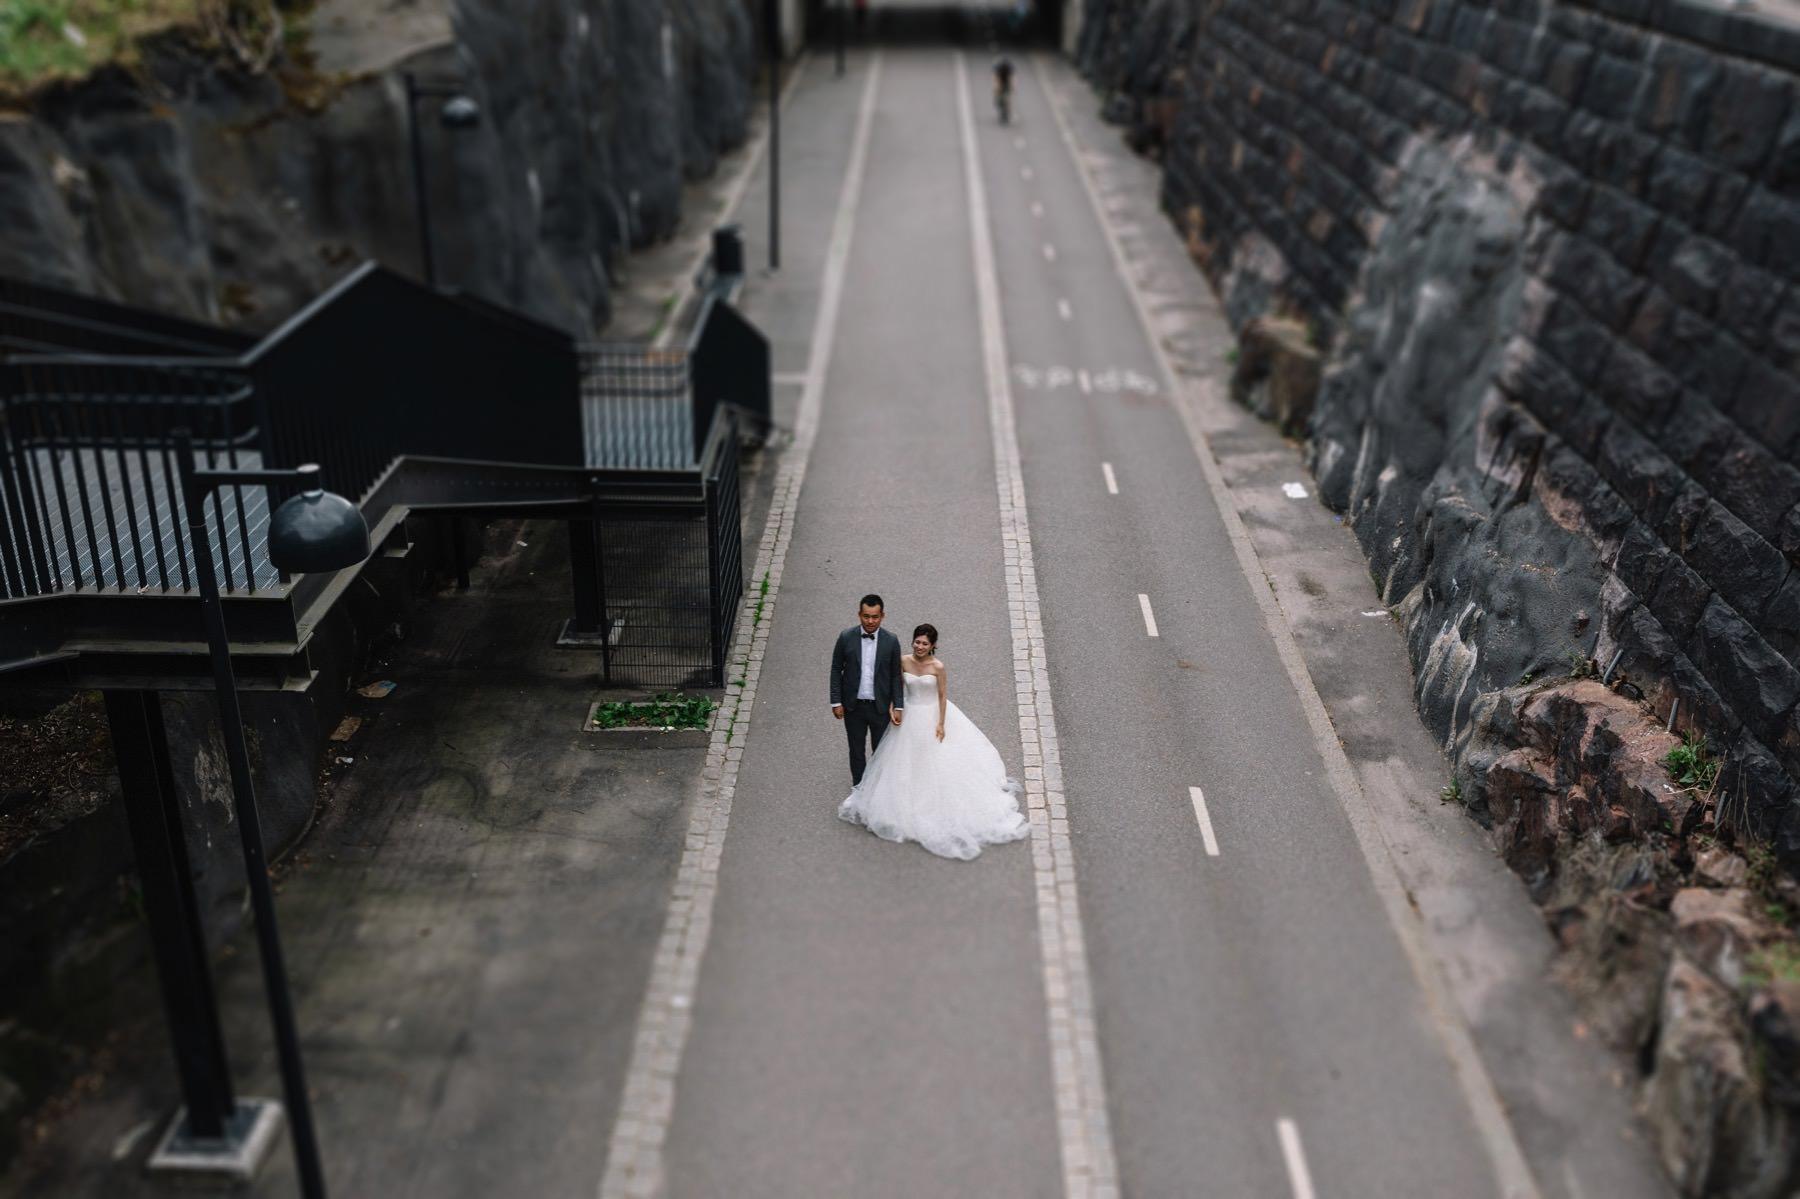 Helsinki prewedding photography